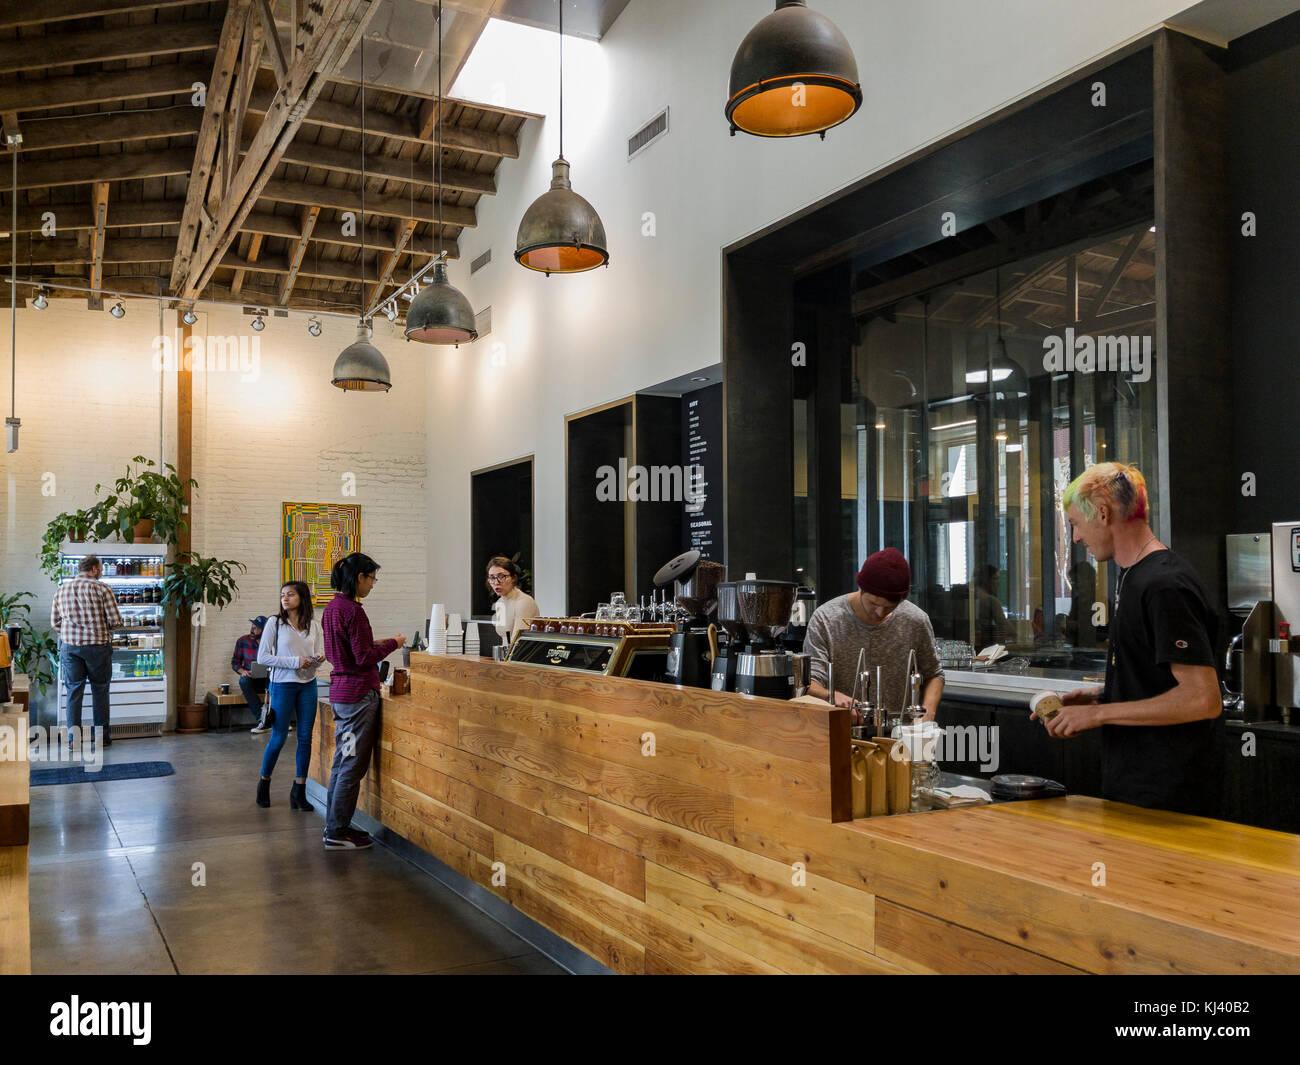 Los Angeles, NOV 5: The famous Stumptown Coffee on NOV 5, 2017 at Los Angeles, California - Stock Image